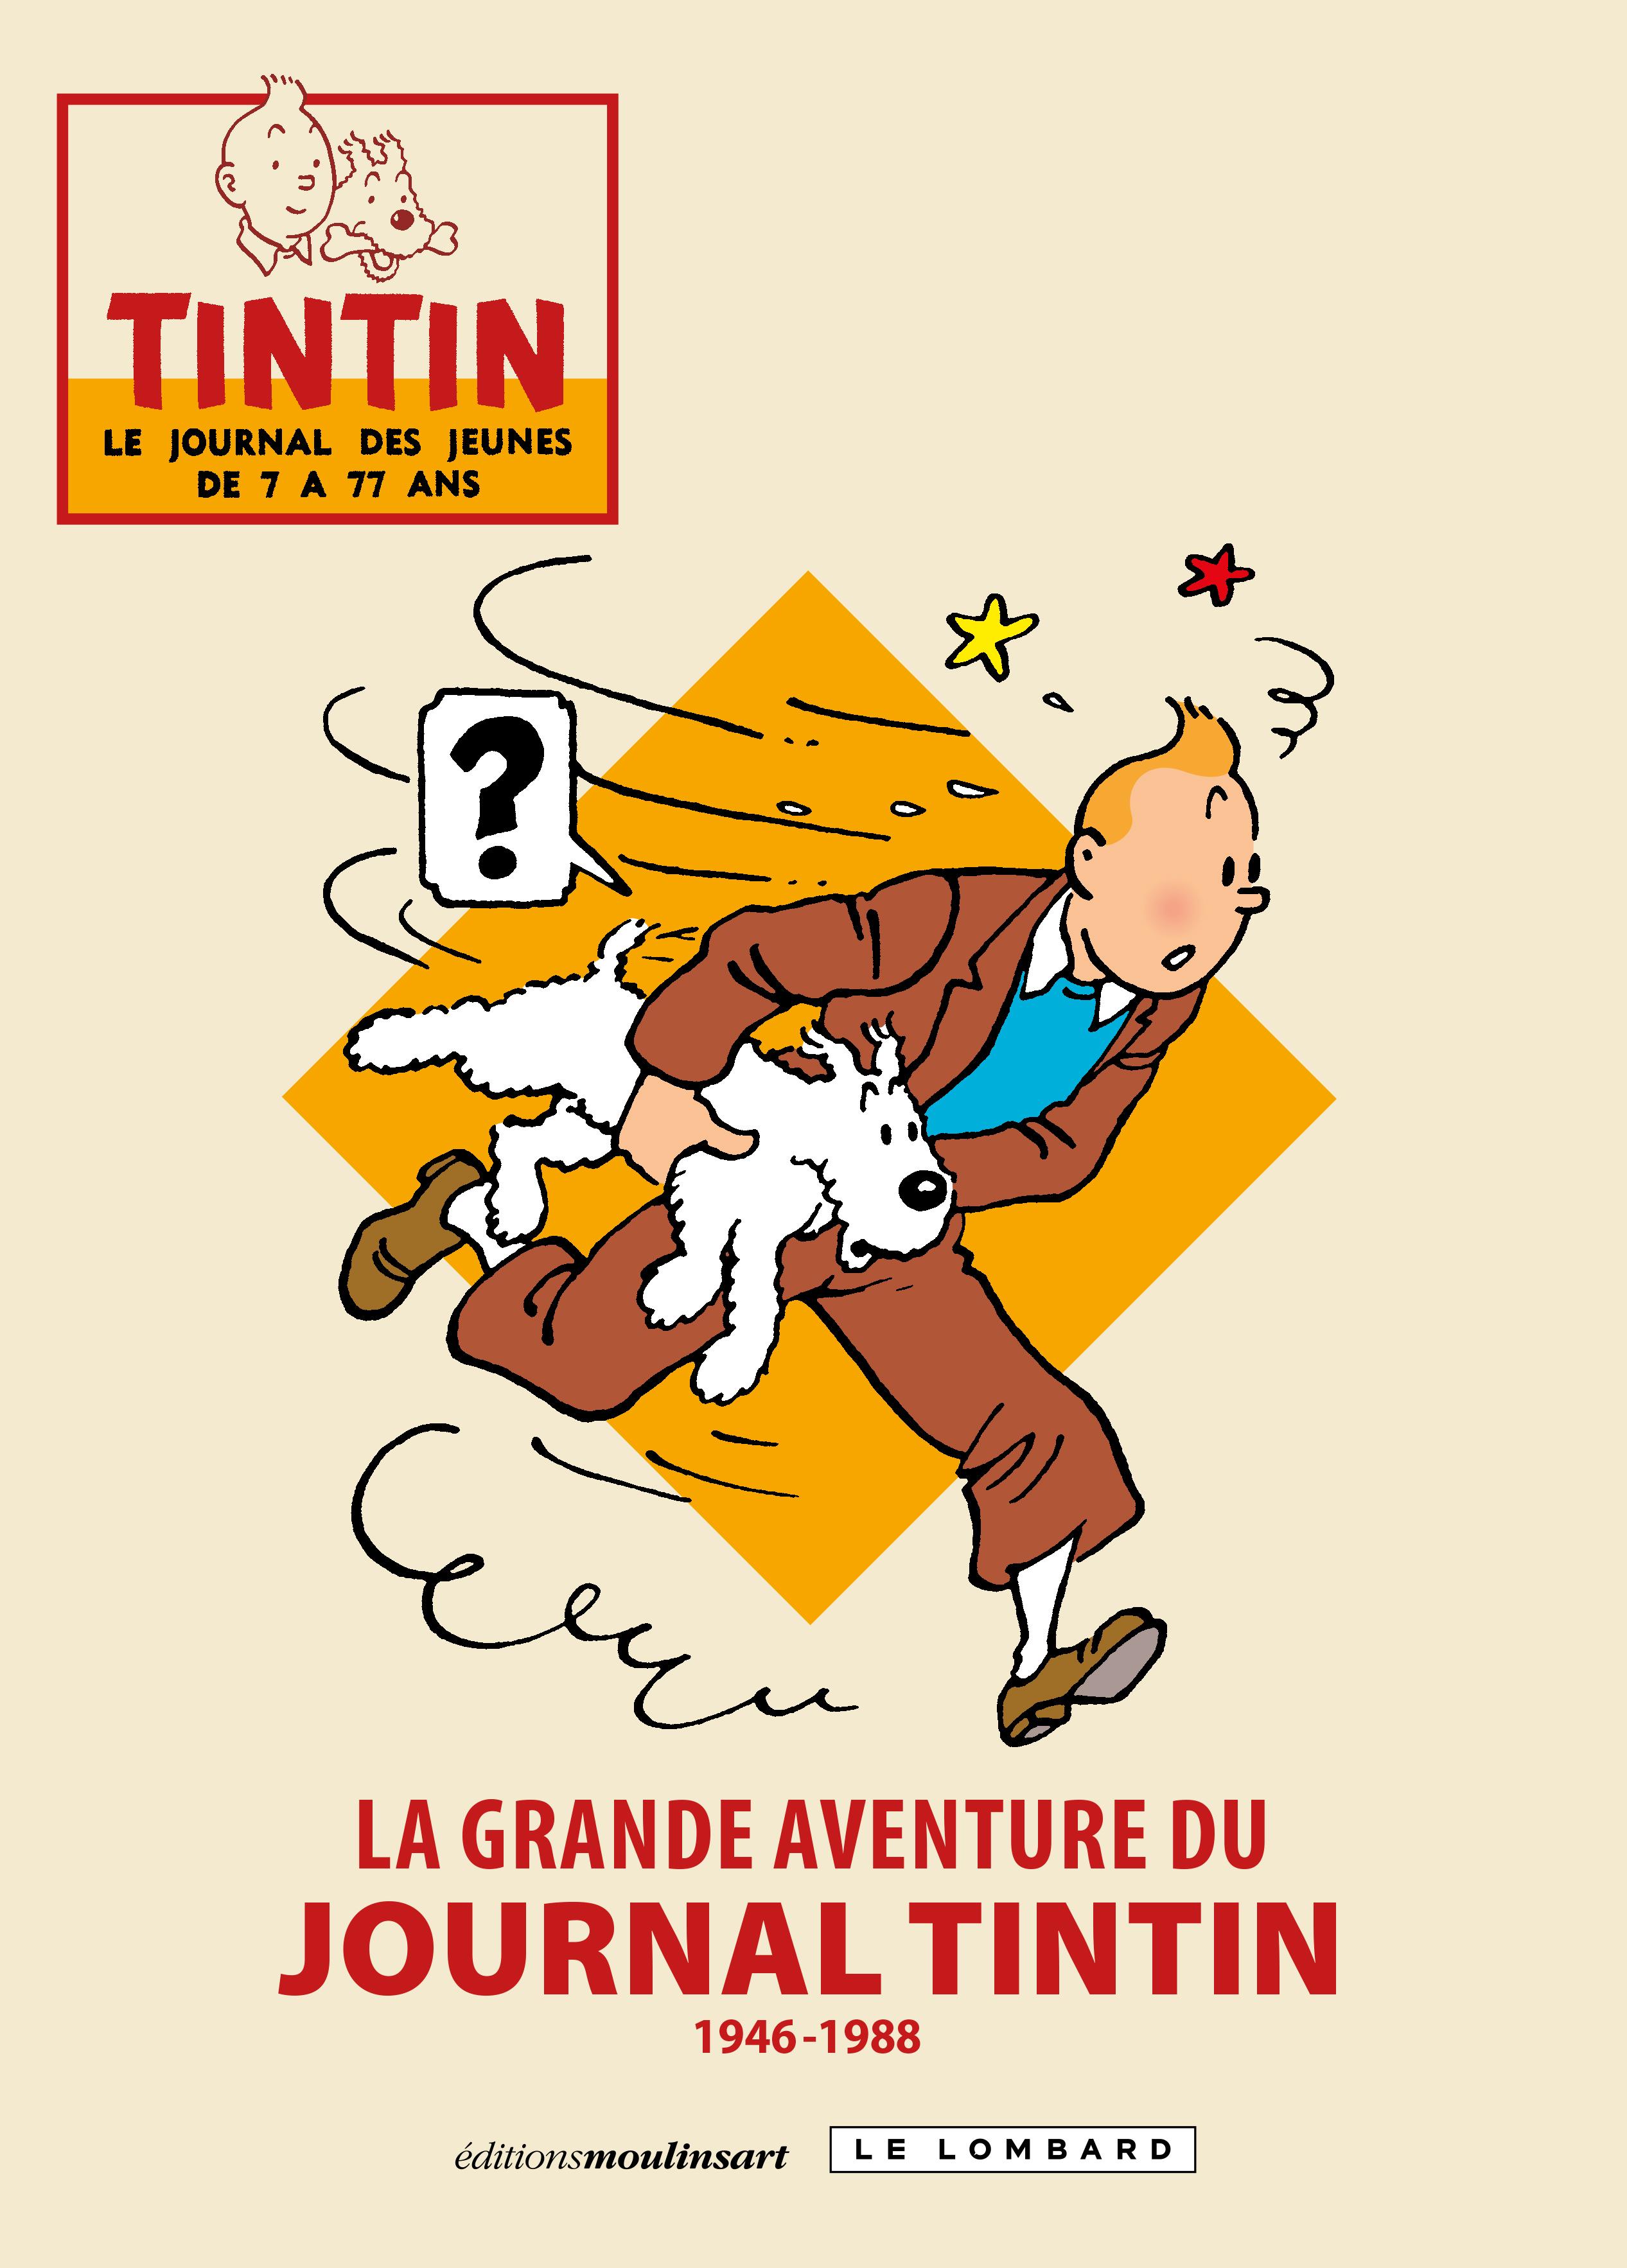 GRANDE AVENTURE JOURNAL TINTIN - LA GRANDE AVENTURE DU JOURNAL TINTIN